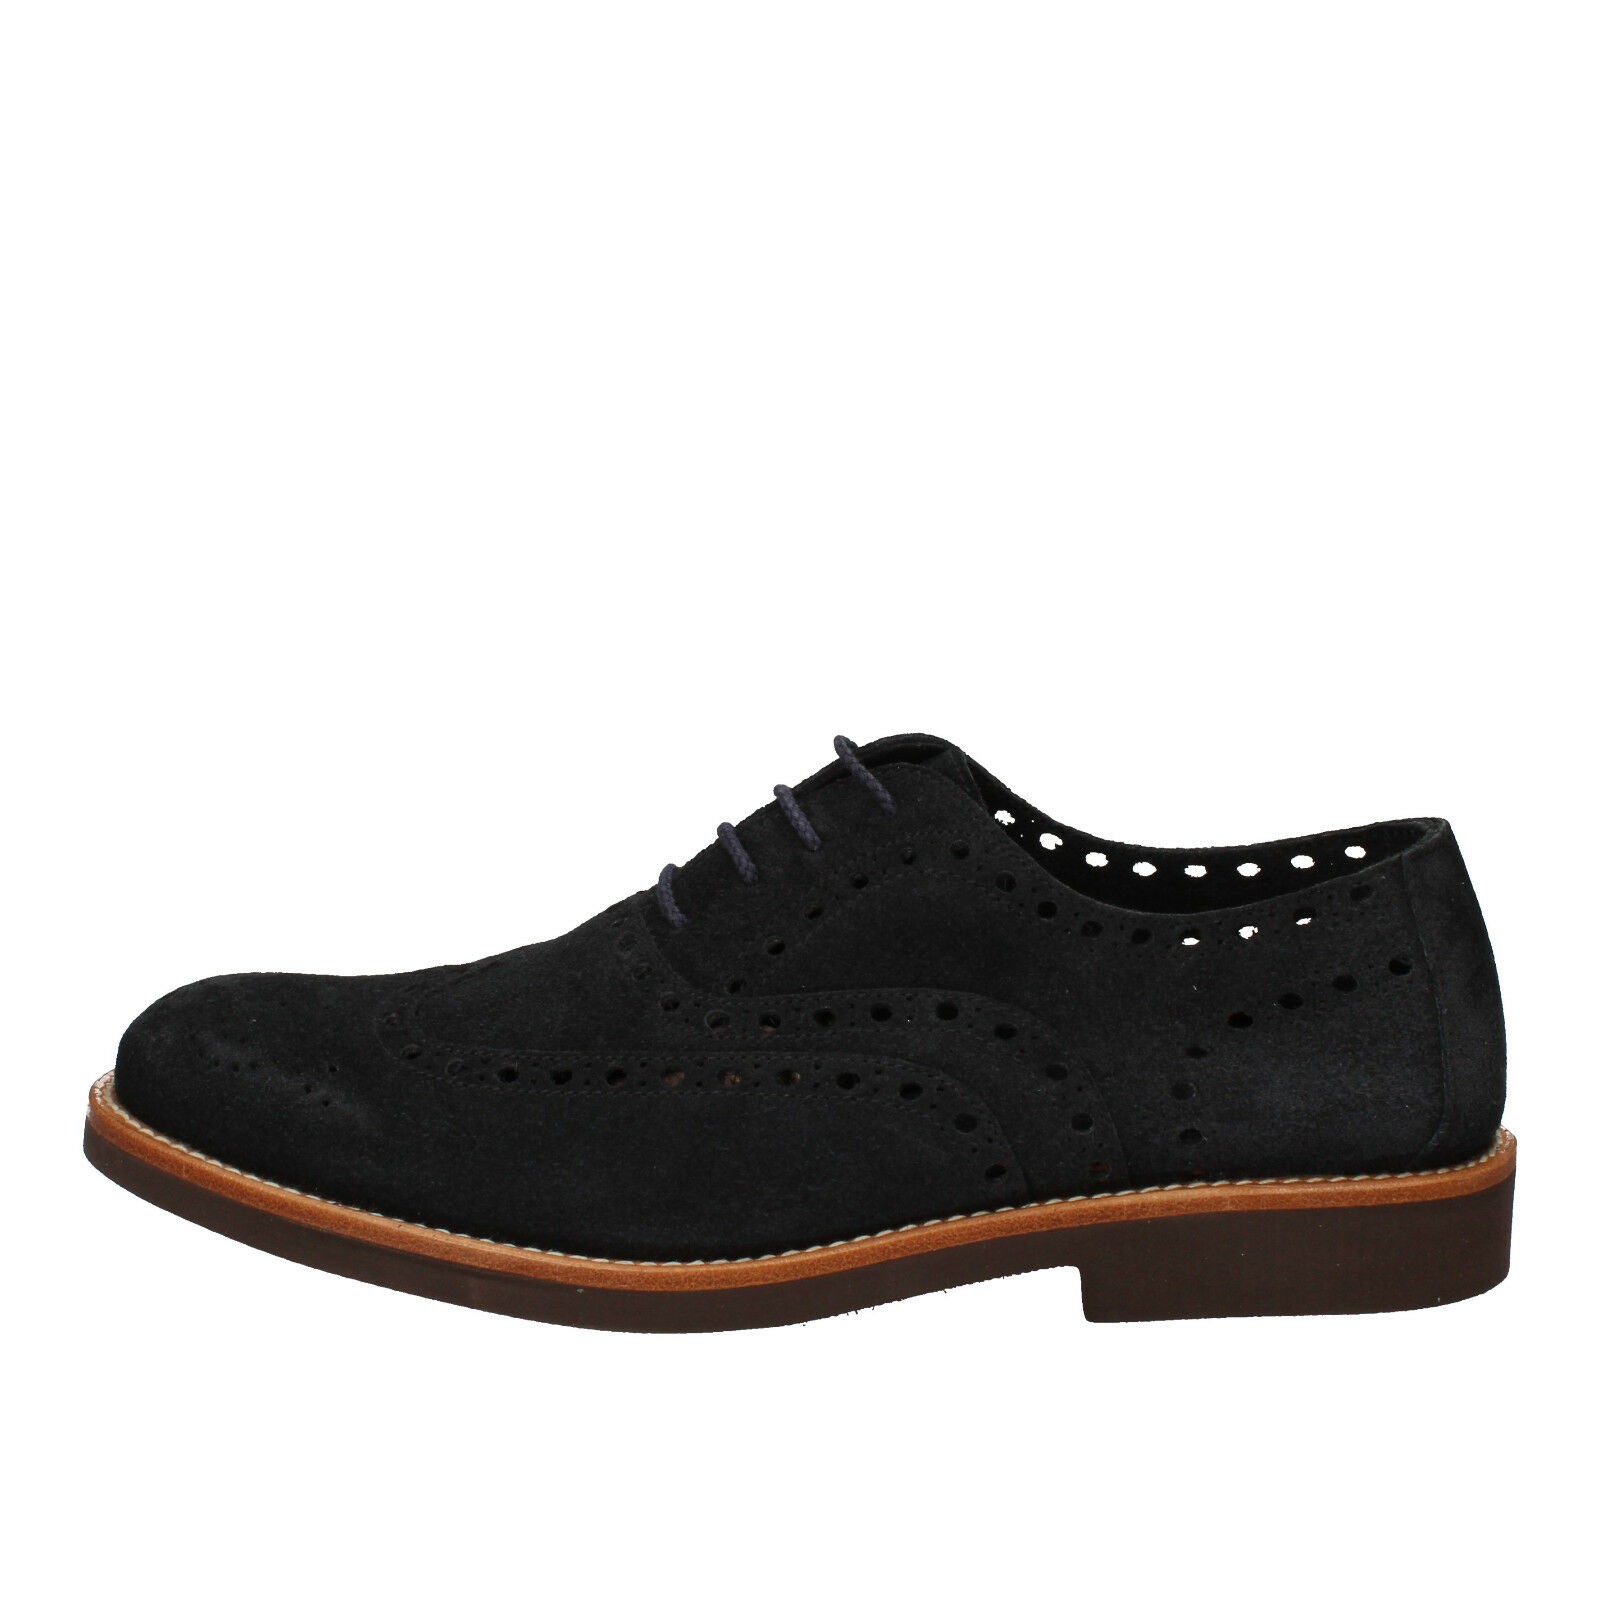 Men's shoes DI MELLA 11 () elegant bluee suede AD229-H